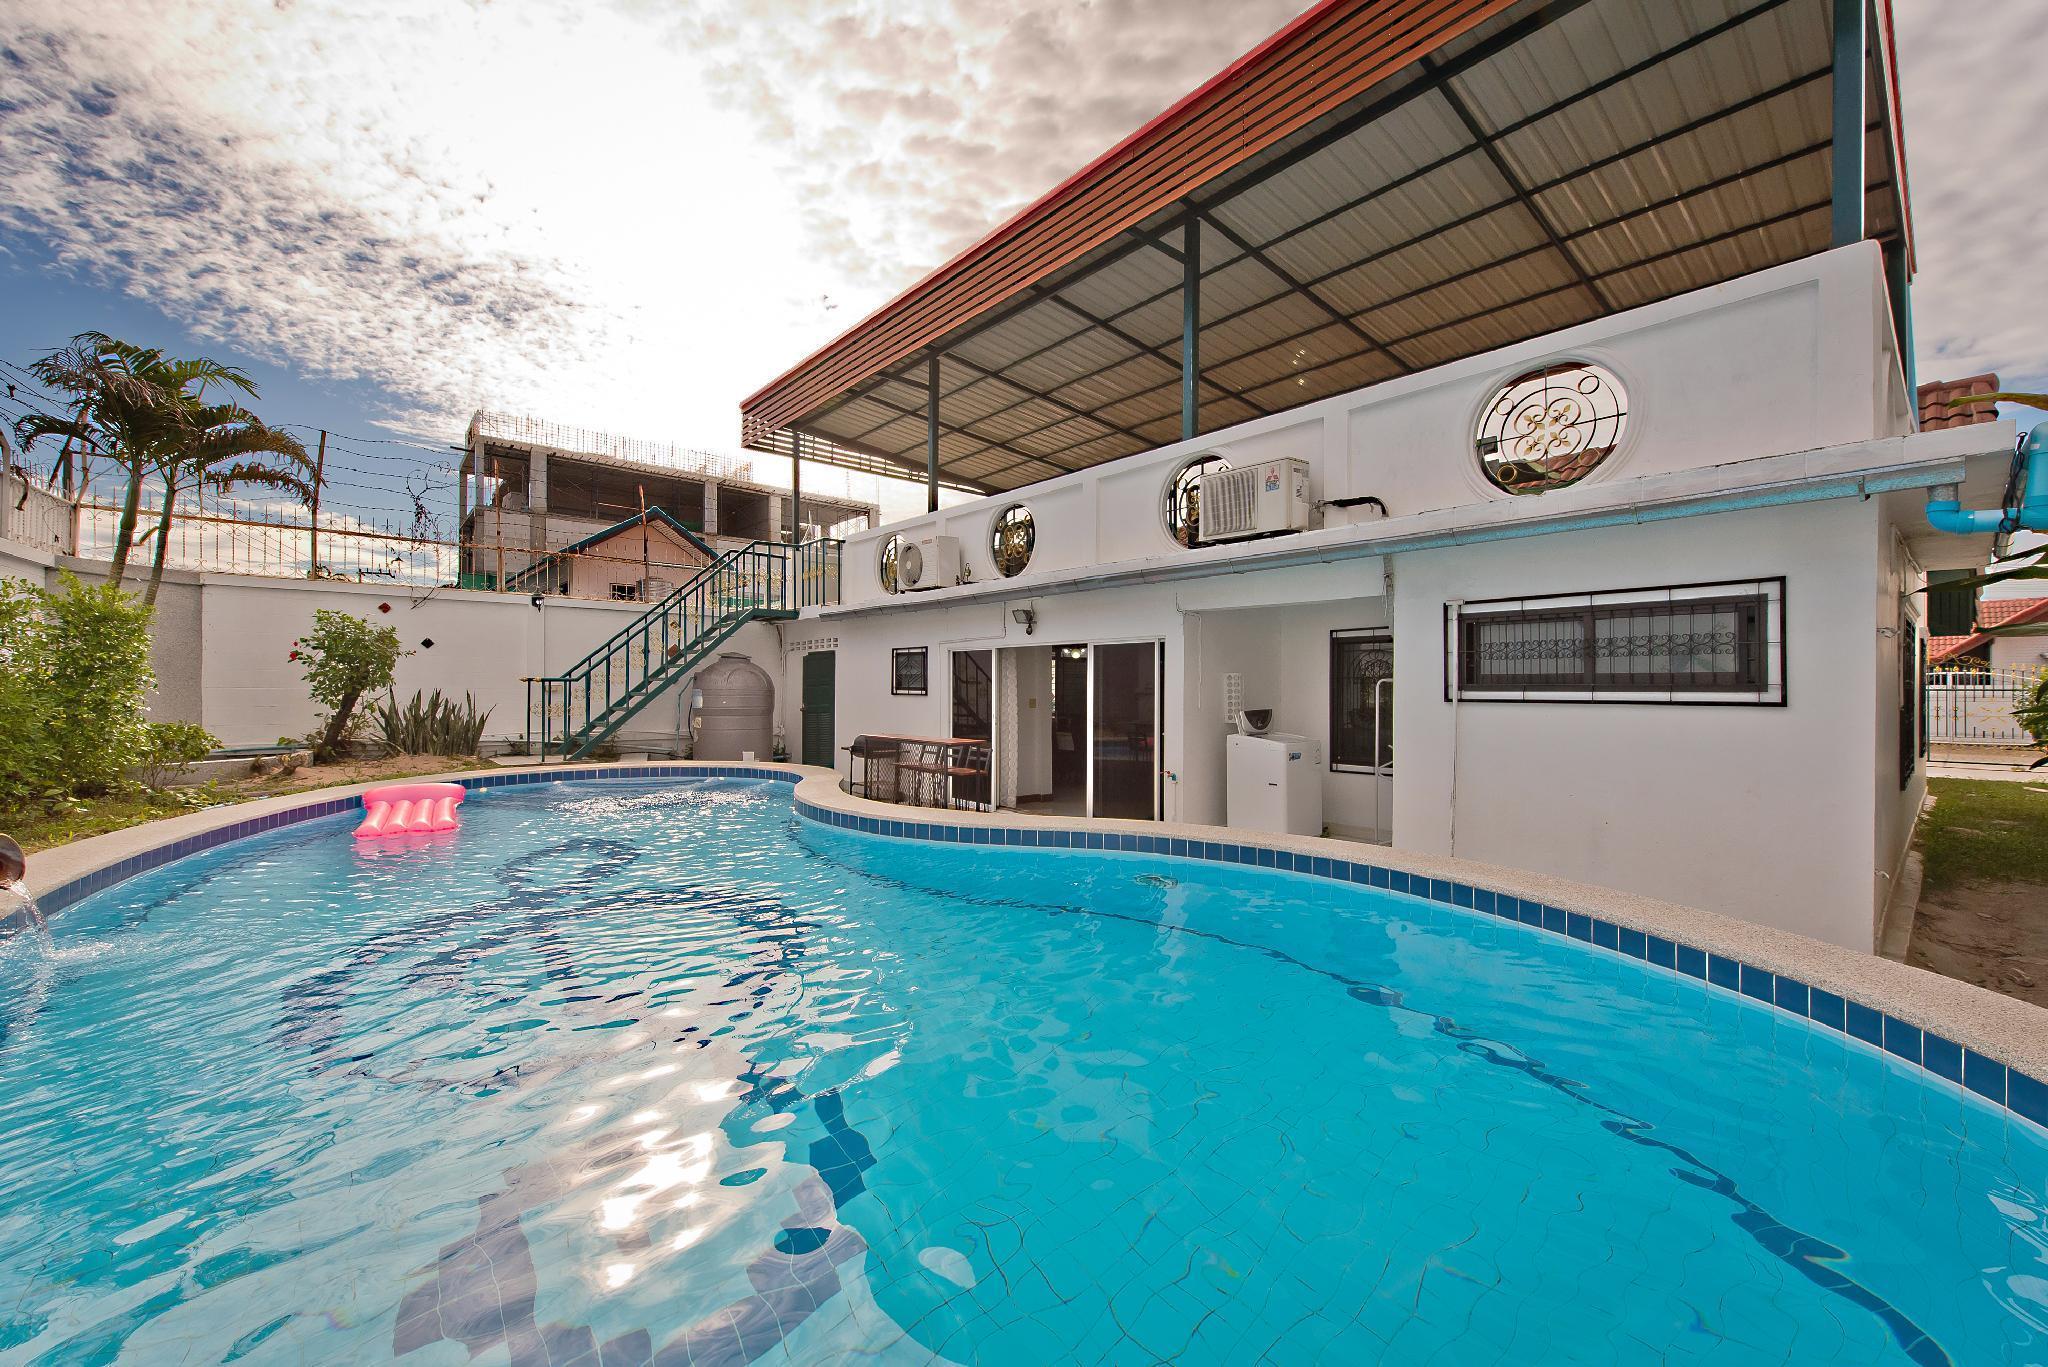 Rooftop Pool Villa w/ BBQ & Pool-Table วิลลา 3 ห้องนอน 3 ห้องน้ำส่วนตัว ขนาด 180 ตร.ม. – พัทยาใต้